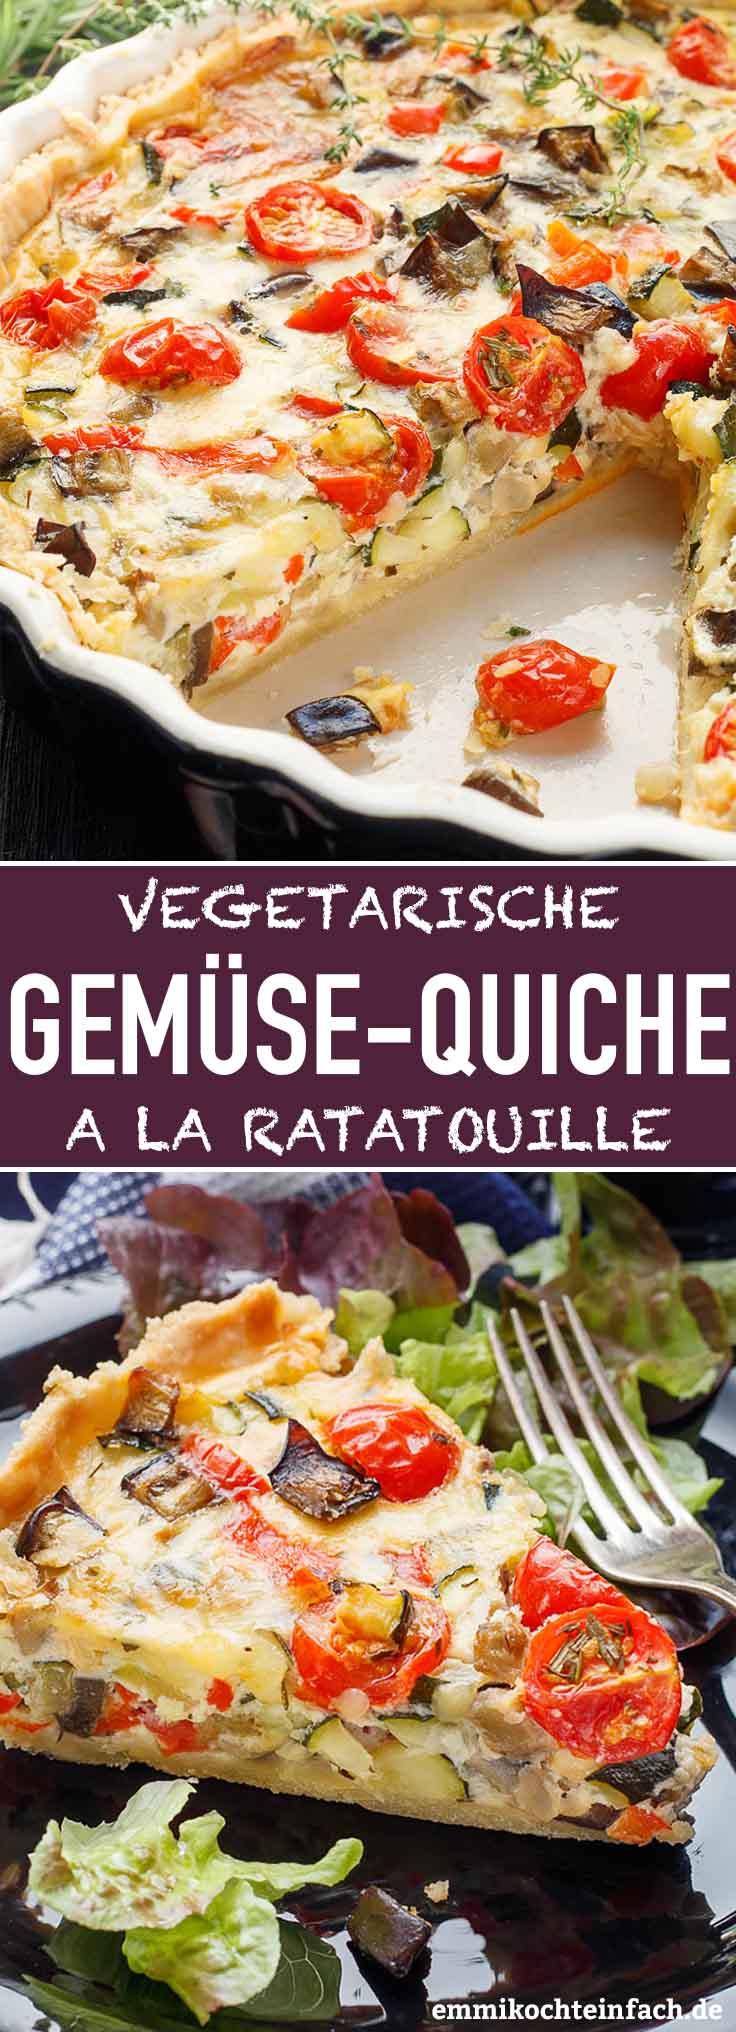 Gemüse-Quiche ala Ratatouille - www.emmikochteinfach.de